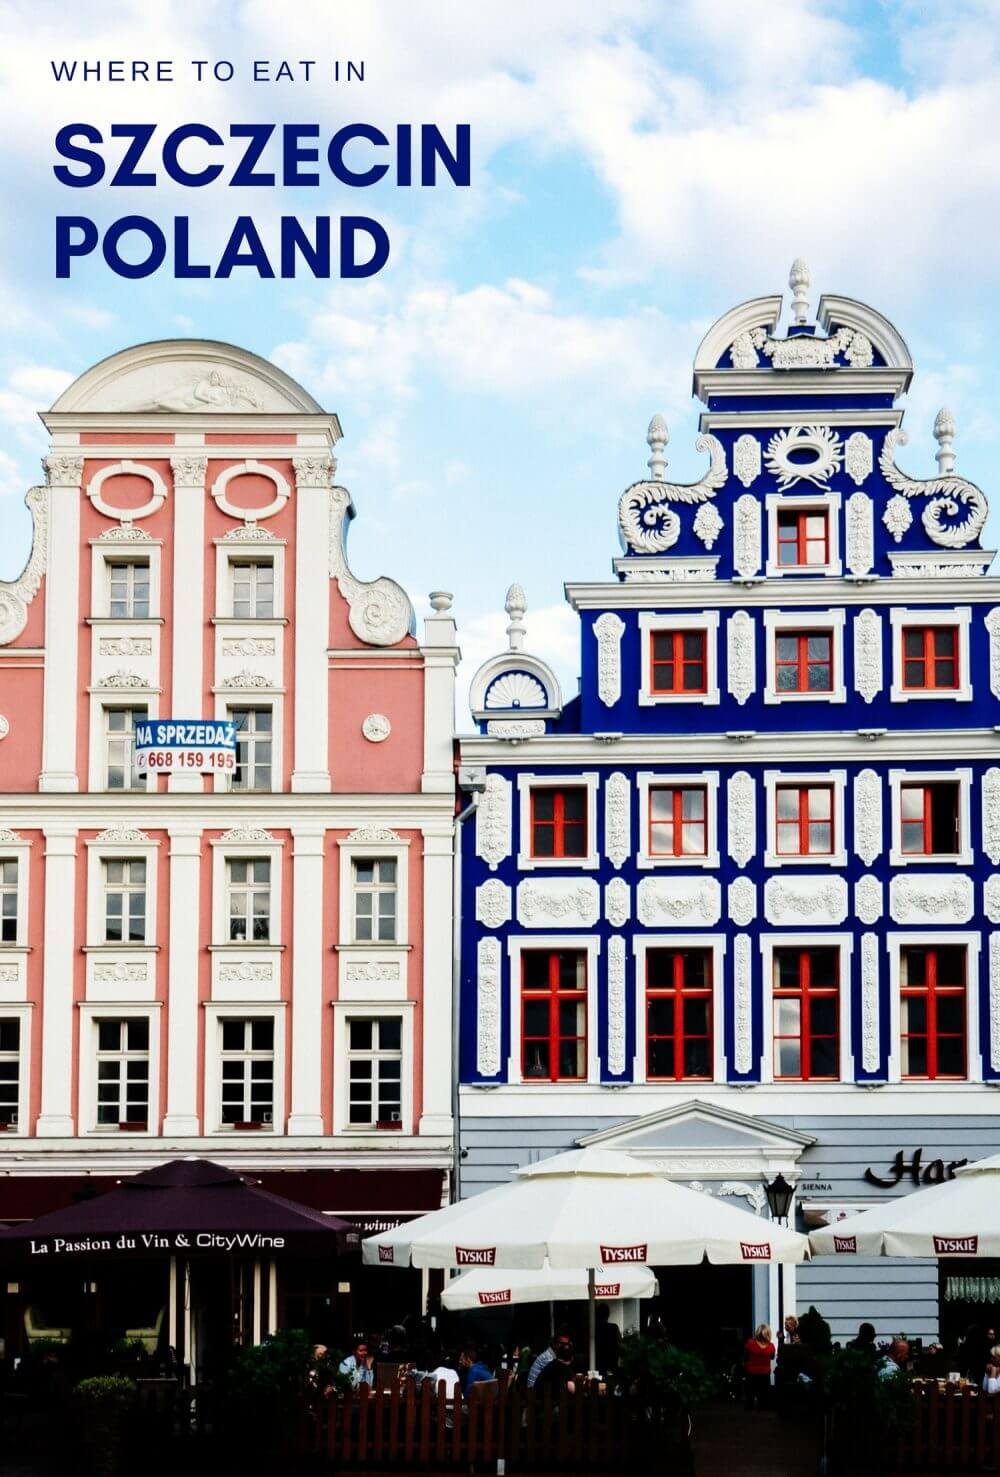 Where to Eat in Szczecin